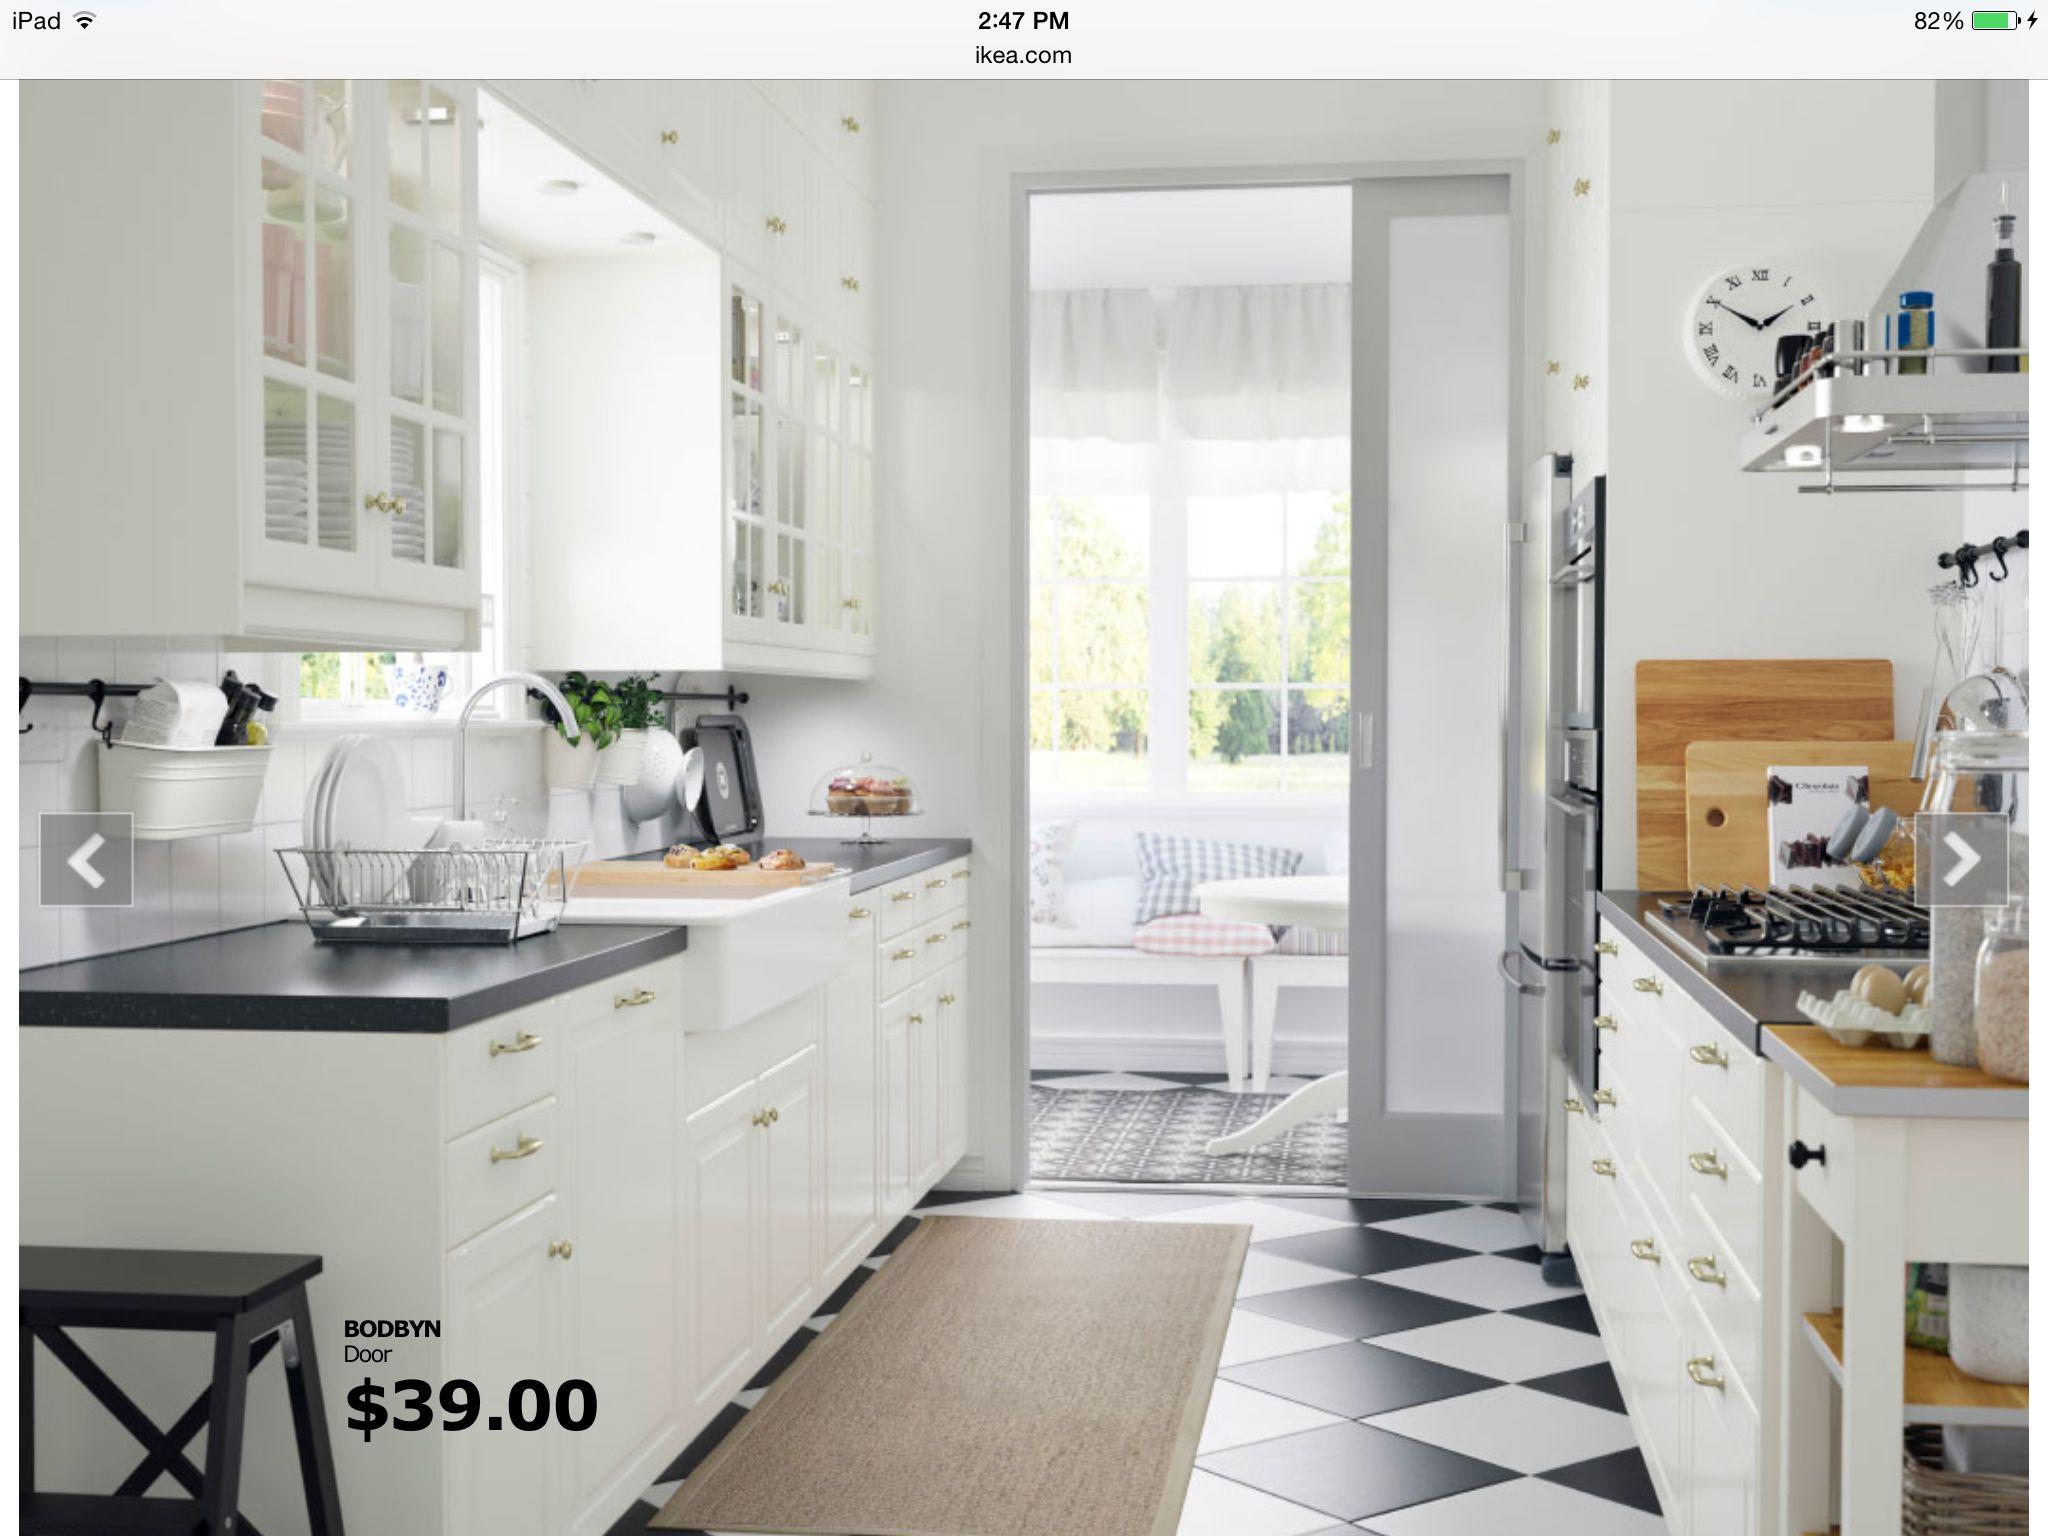 IKEA 1920s kitchen update | Tim\'s house | Pinterest | Kitchen ...